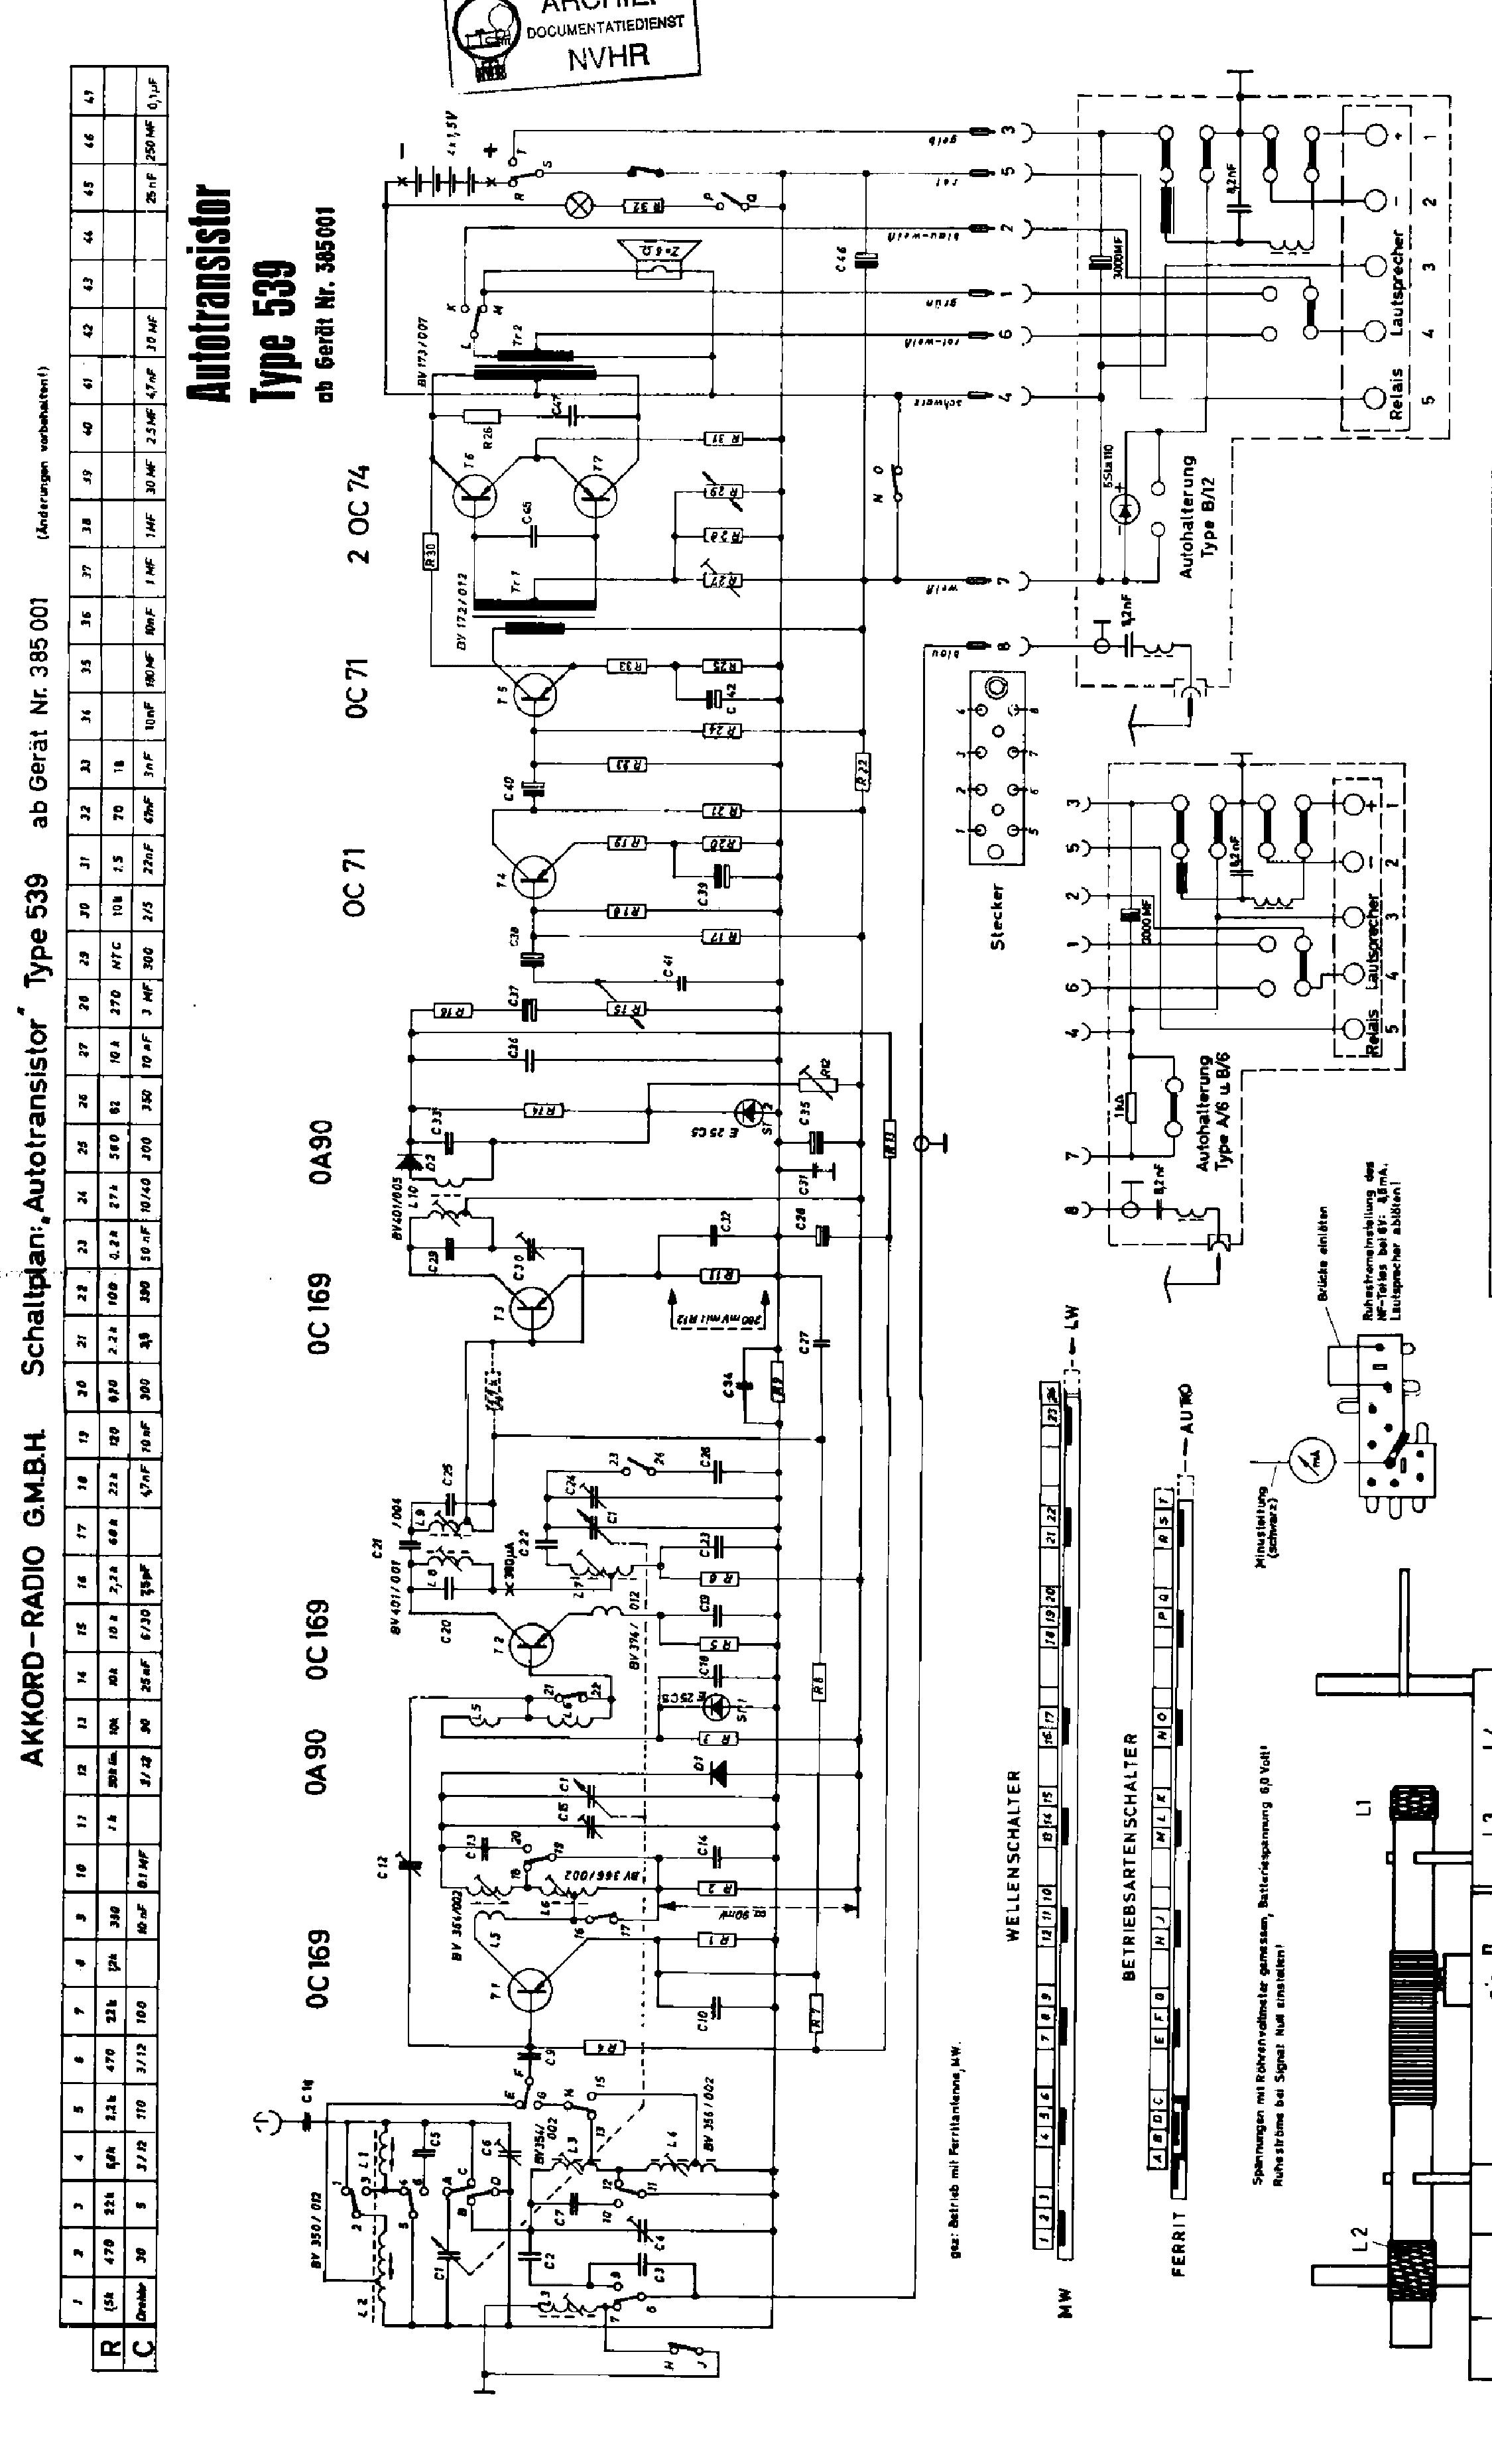 akkord trifels radio sch service manual download